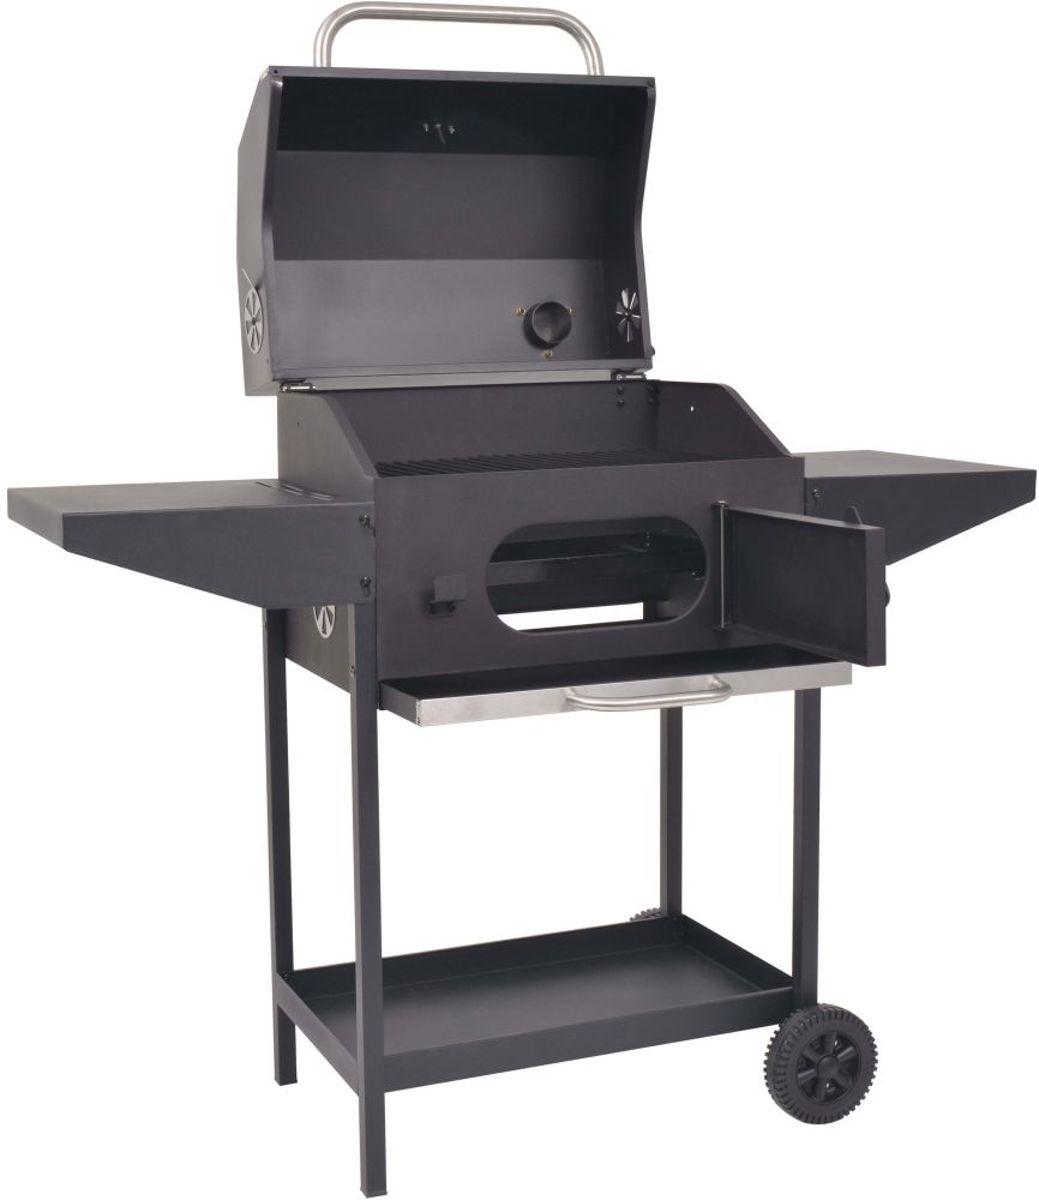 Barbecue Houtskool met Wielen en onderplank / Houtskool BBQ / Barbeque met wielen